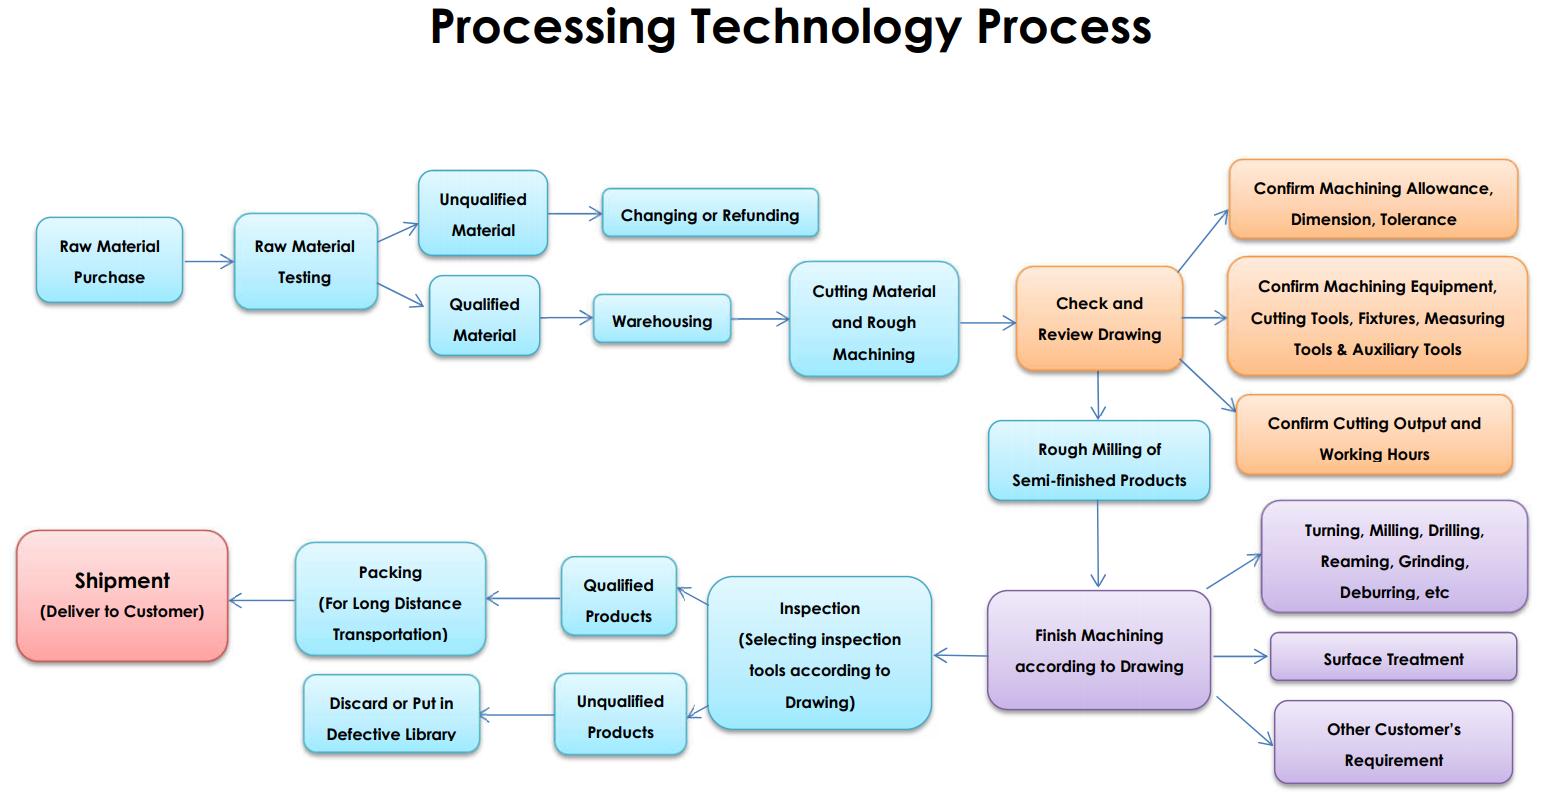 Processing Technology Process